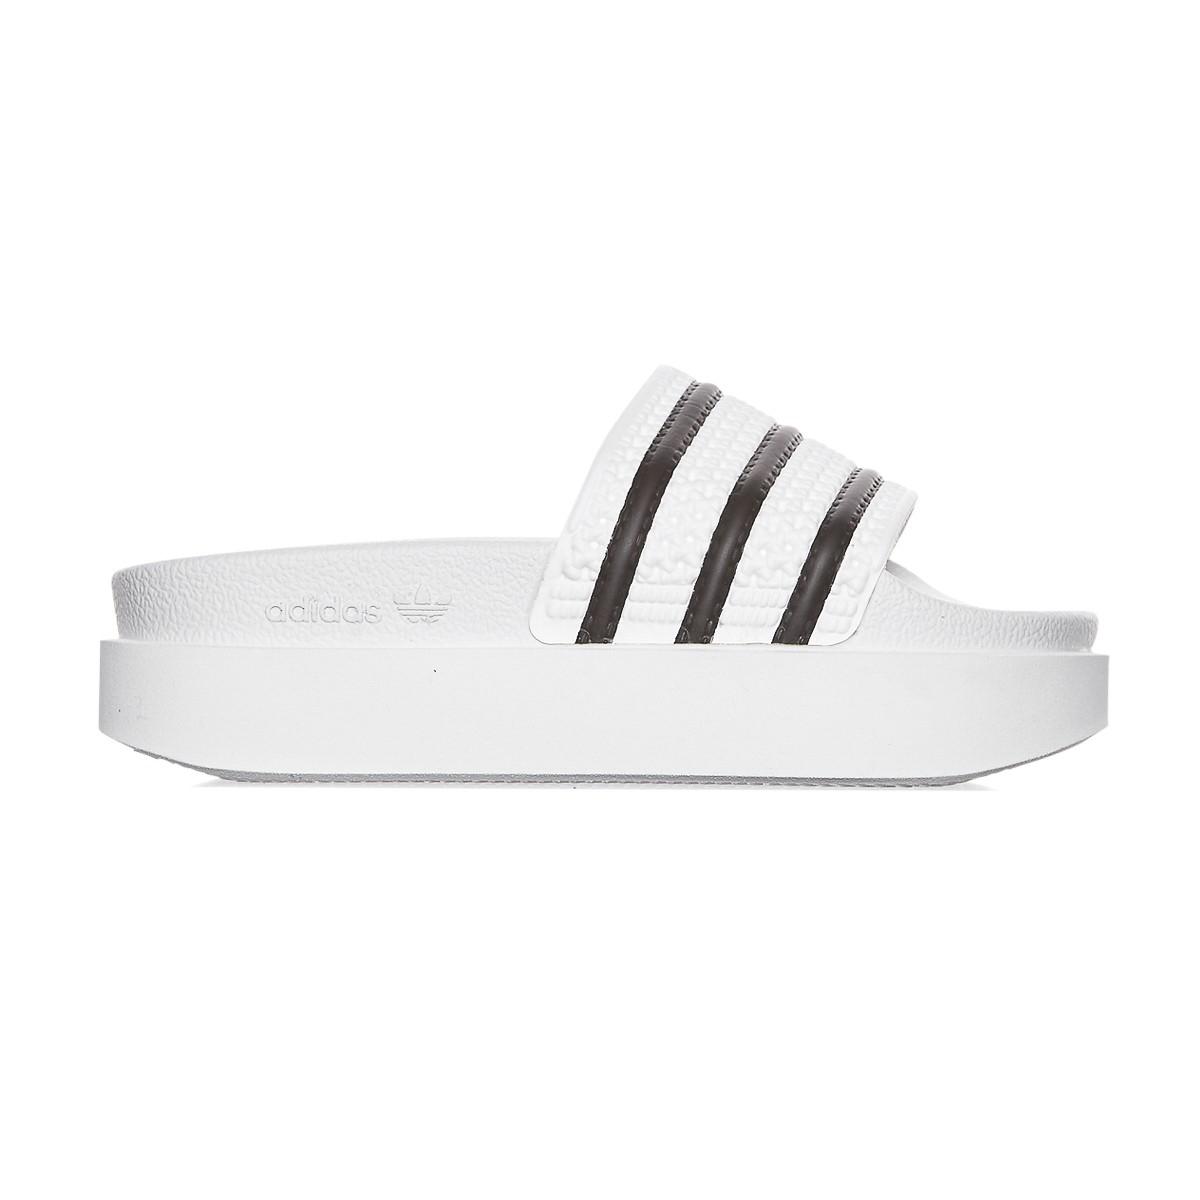 new product 34e48 8989e Lyst - adidas Originals Adilette Bold Slide Sandals in Black